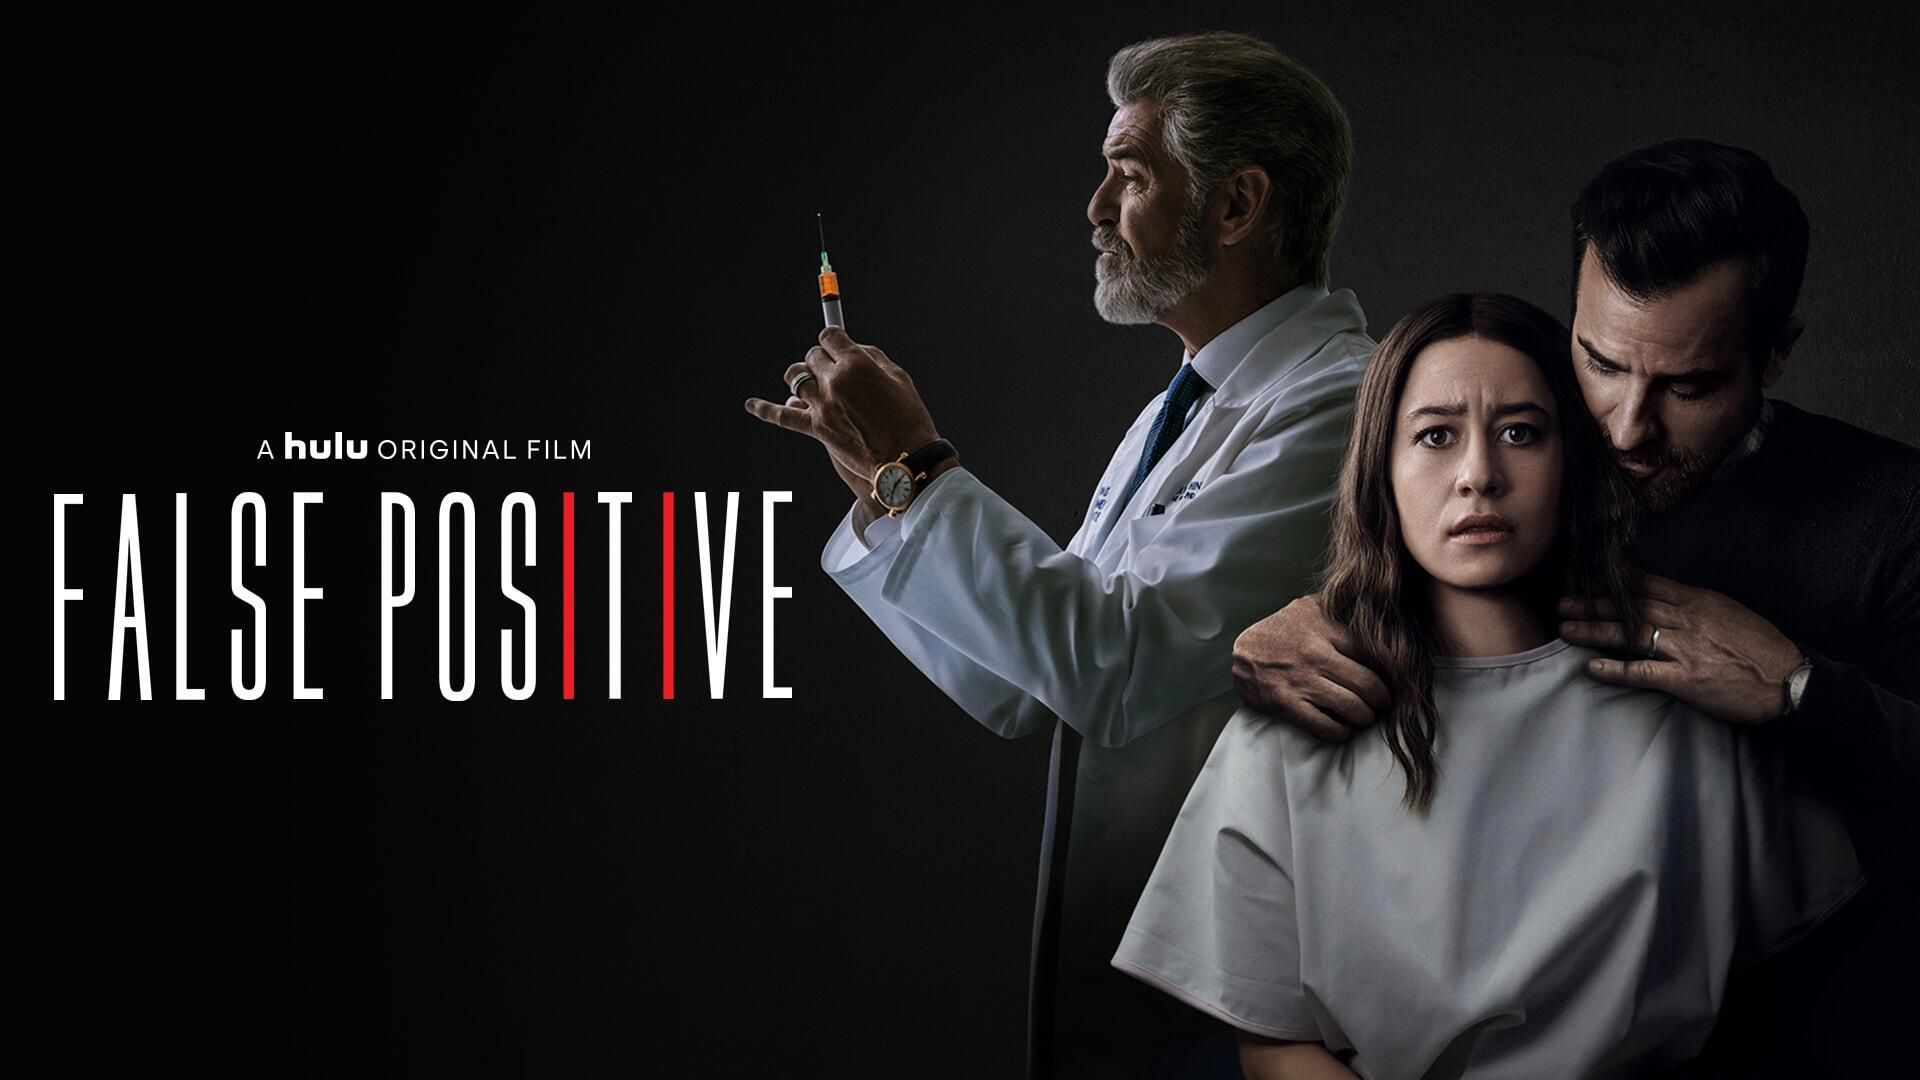 Justin Theroux, Sophia Bush, and Pierce Brosnan in False Positive